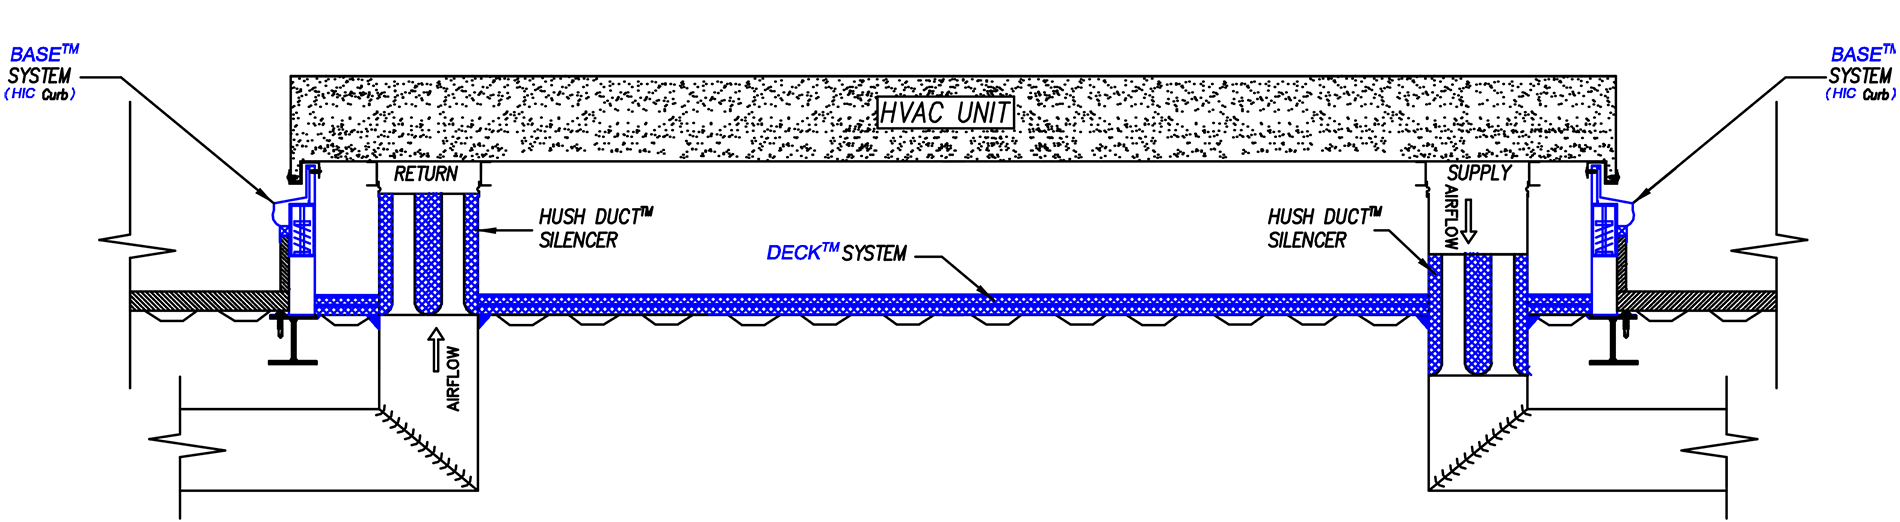 generic-hushcore-whisper-v-system-rtu-curb-acoustical-system